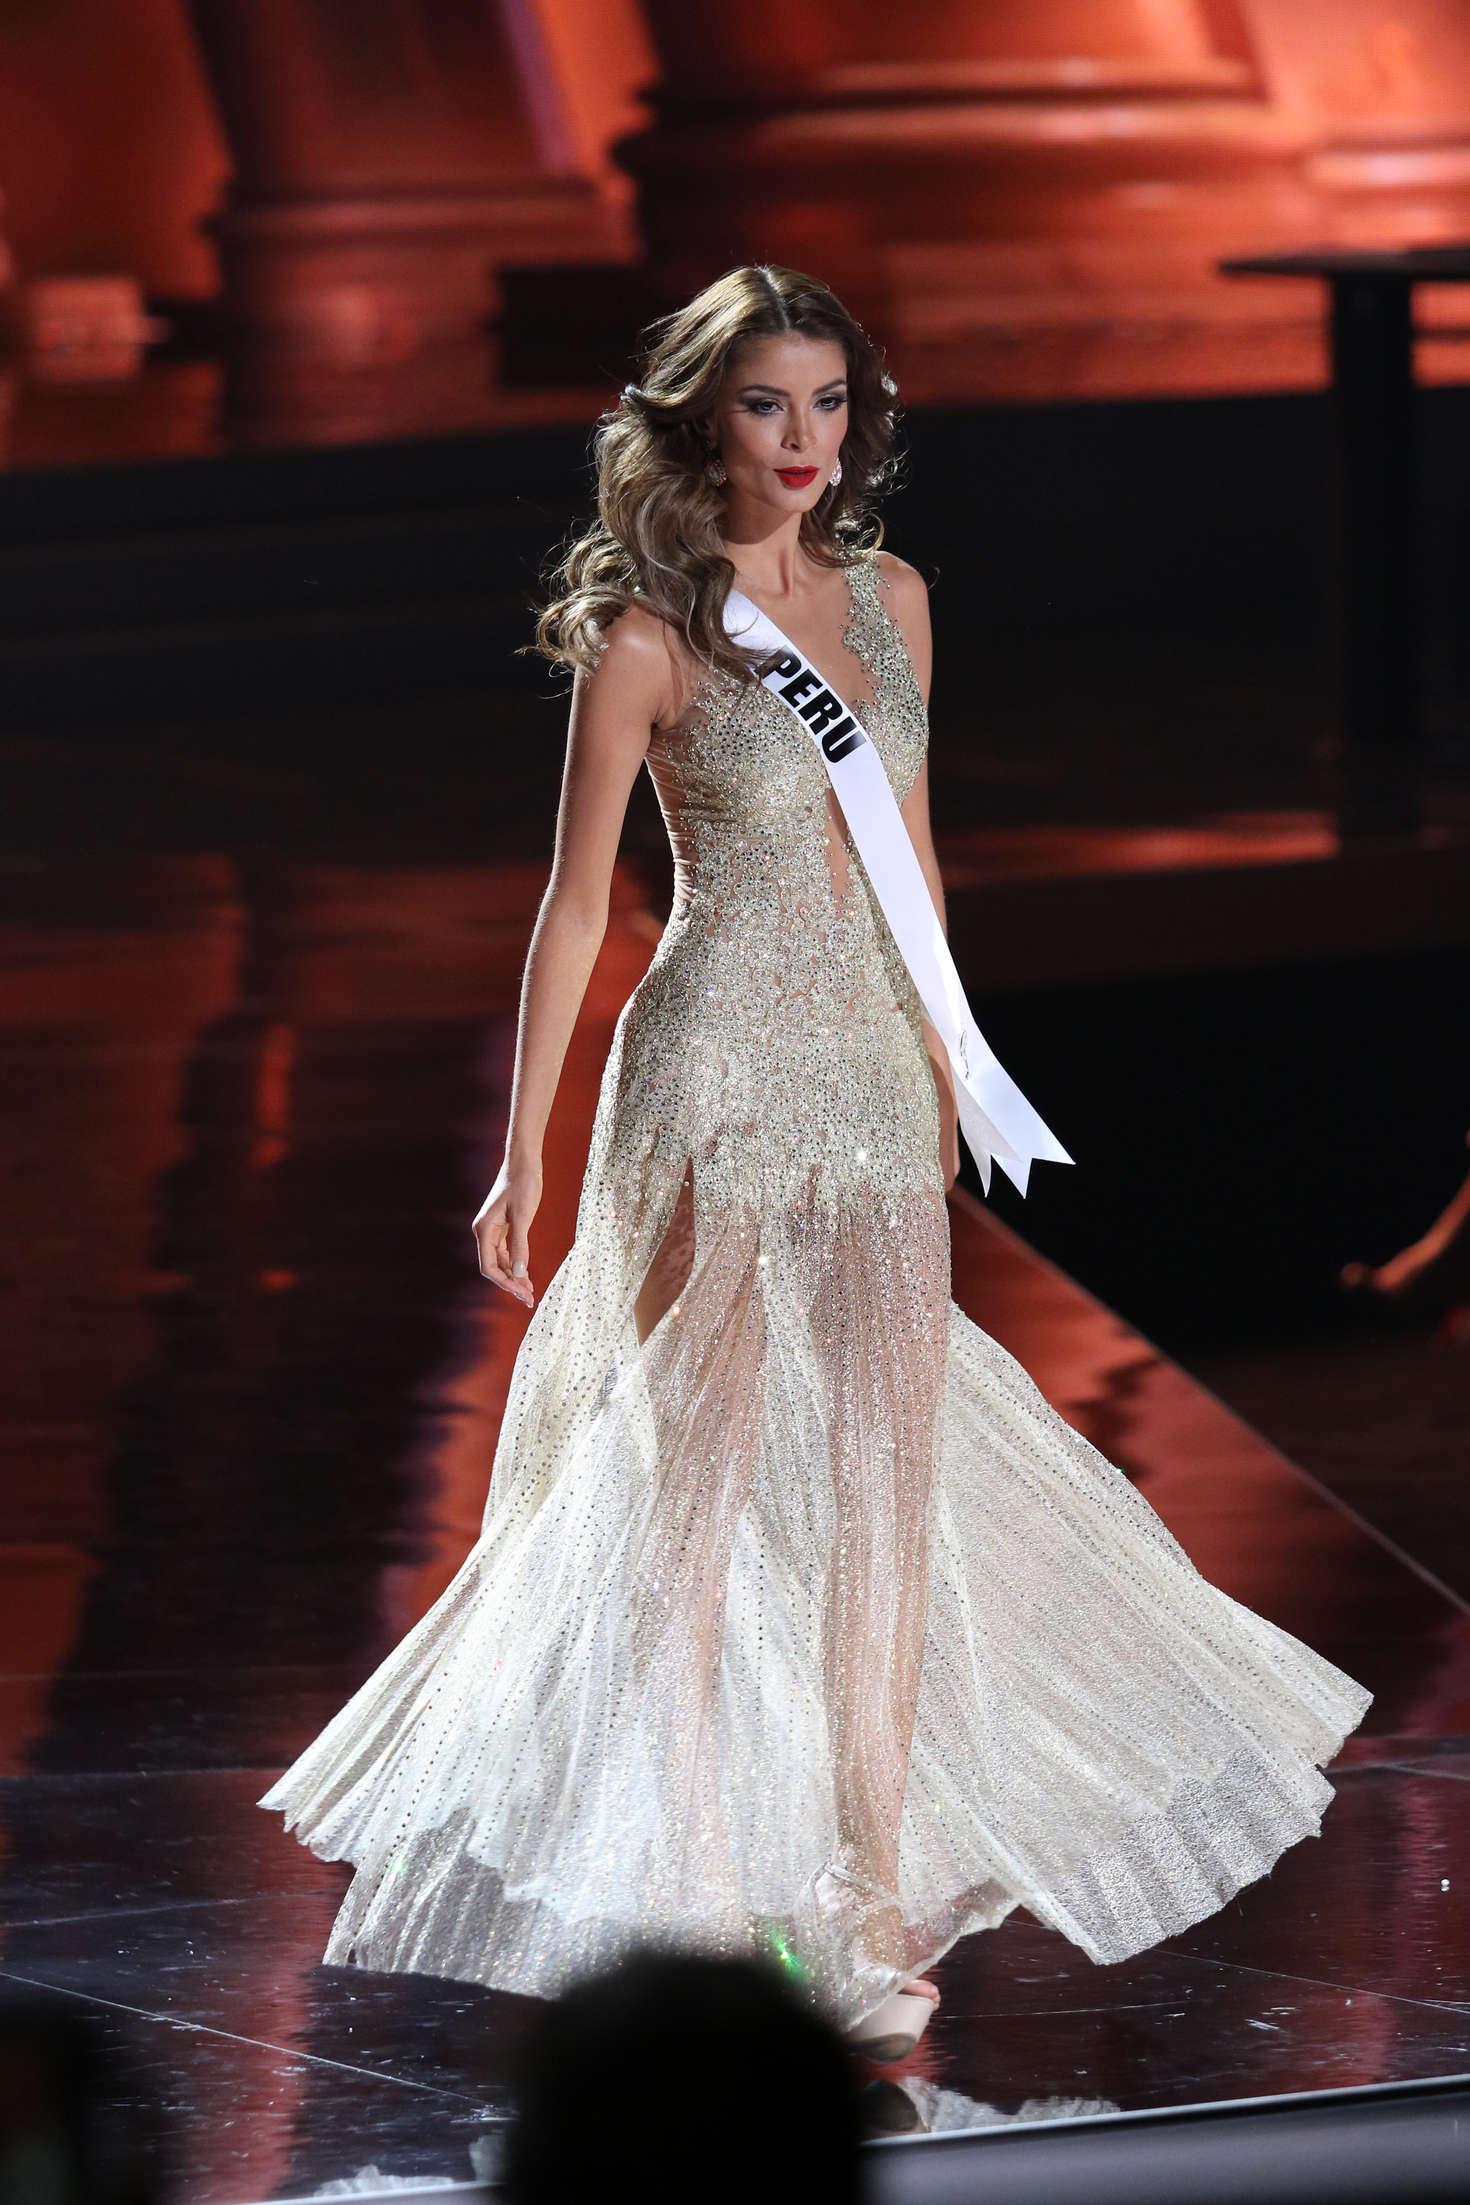 laura spoya, miss america latina mundo 2016. - Página 5 Wytt72e9